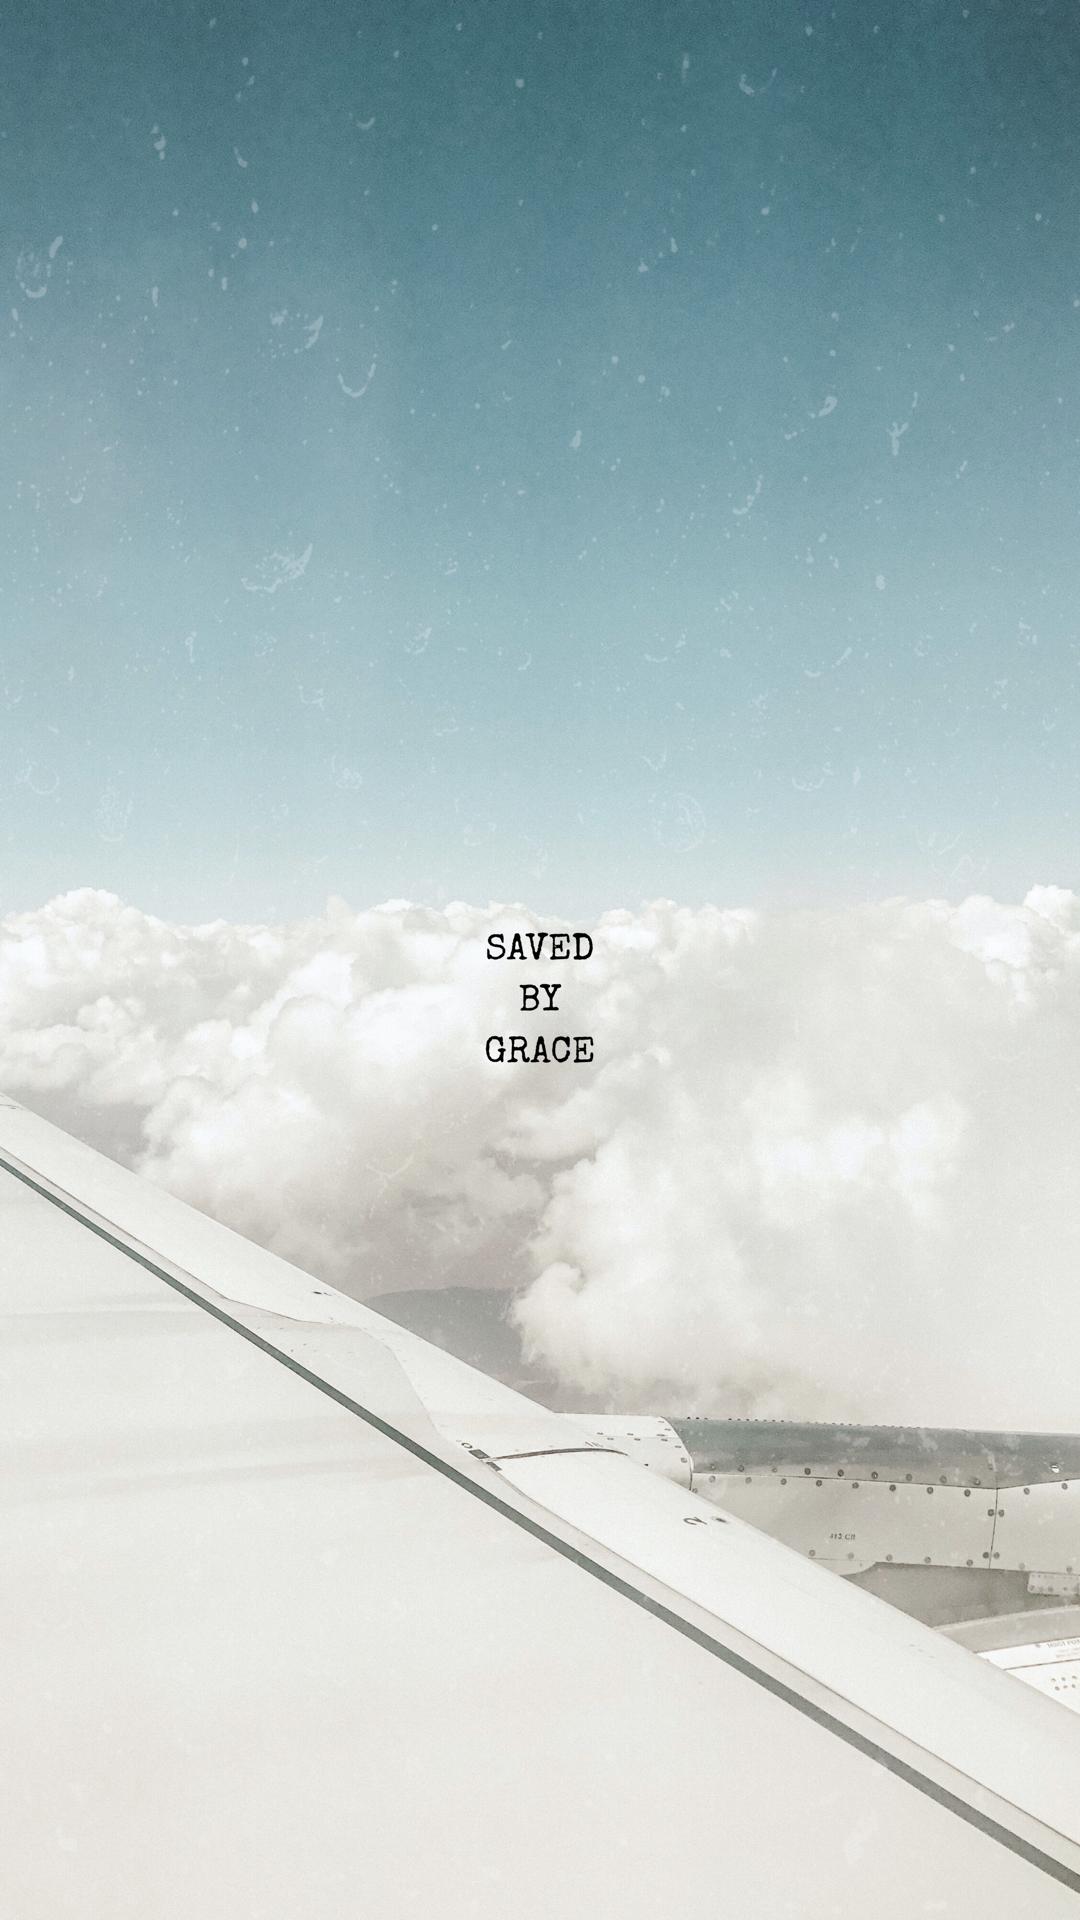 Saved by grace Criado por viihrocha Jesus wallpaper 1080x1920